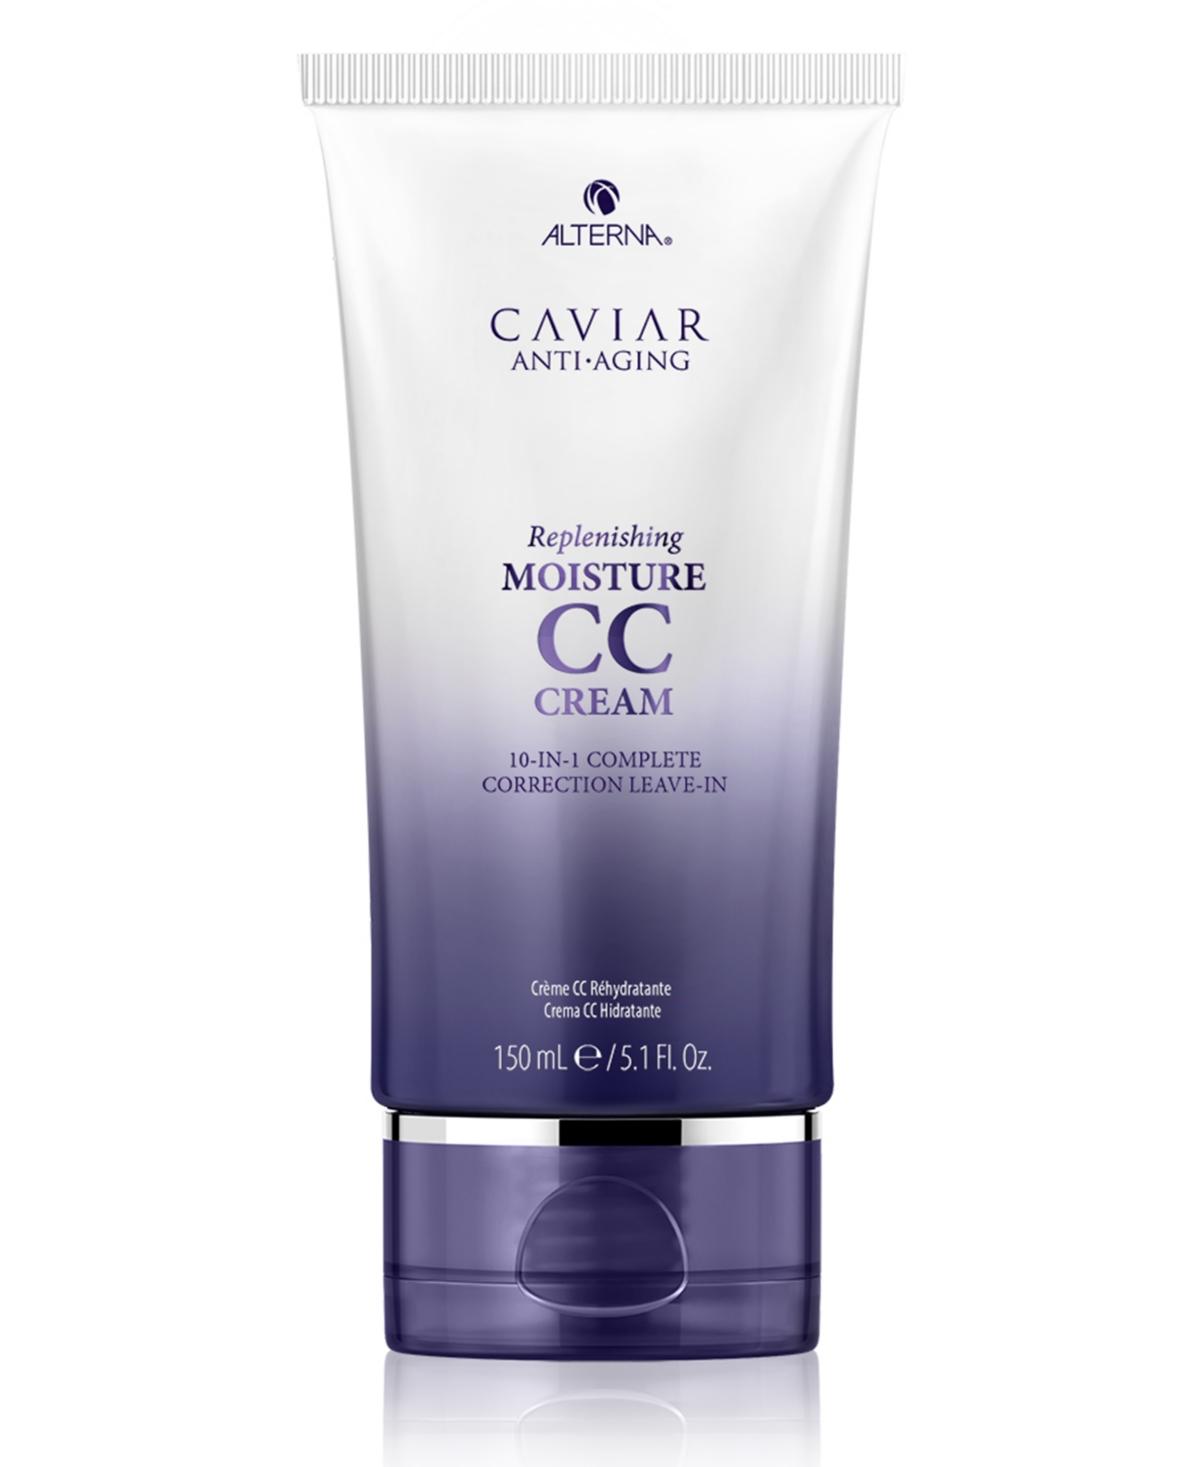 Alterna Caviar Anti-Aging Replenishing Moisture Cc Cream, 5.1-oz.